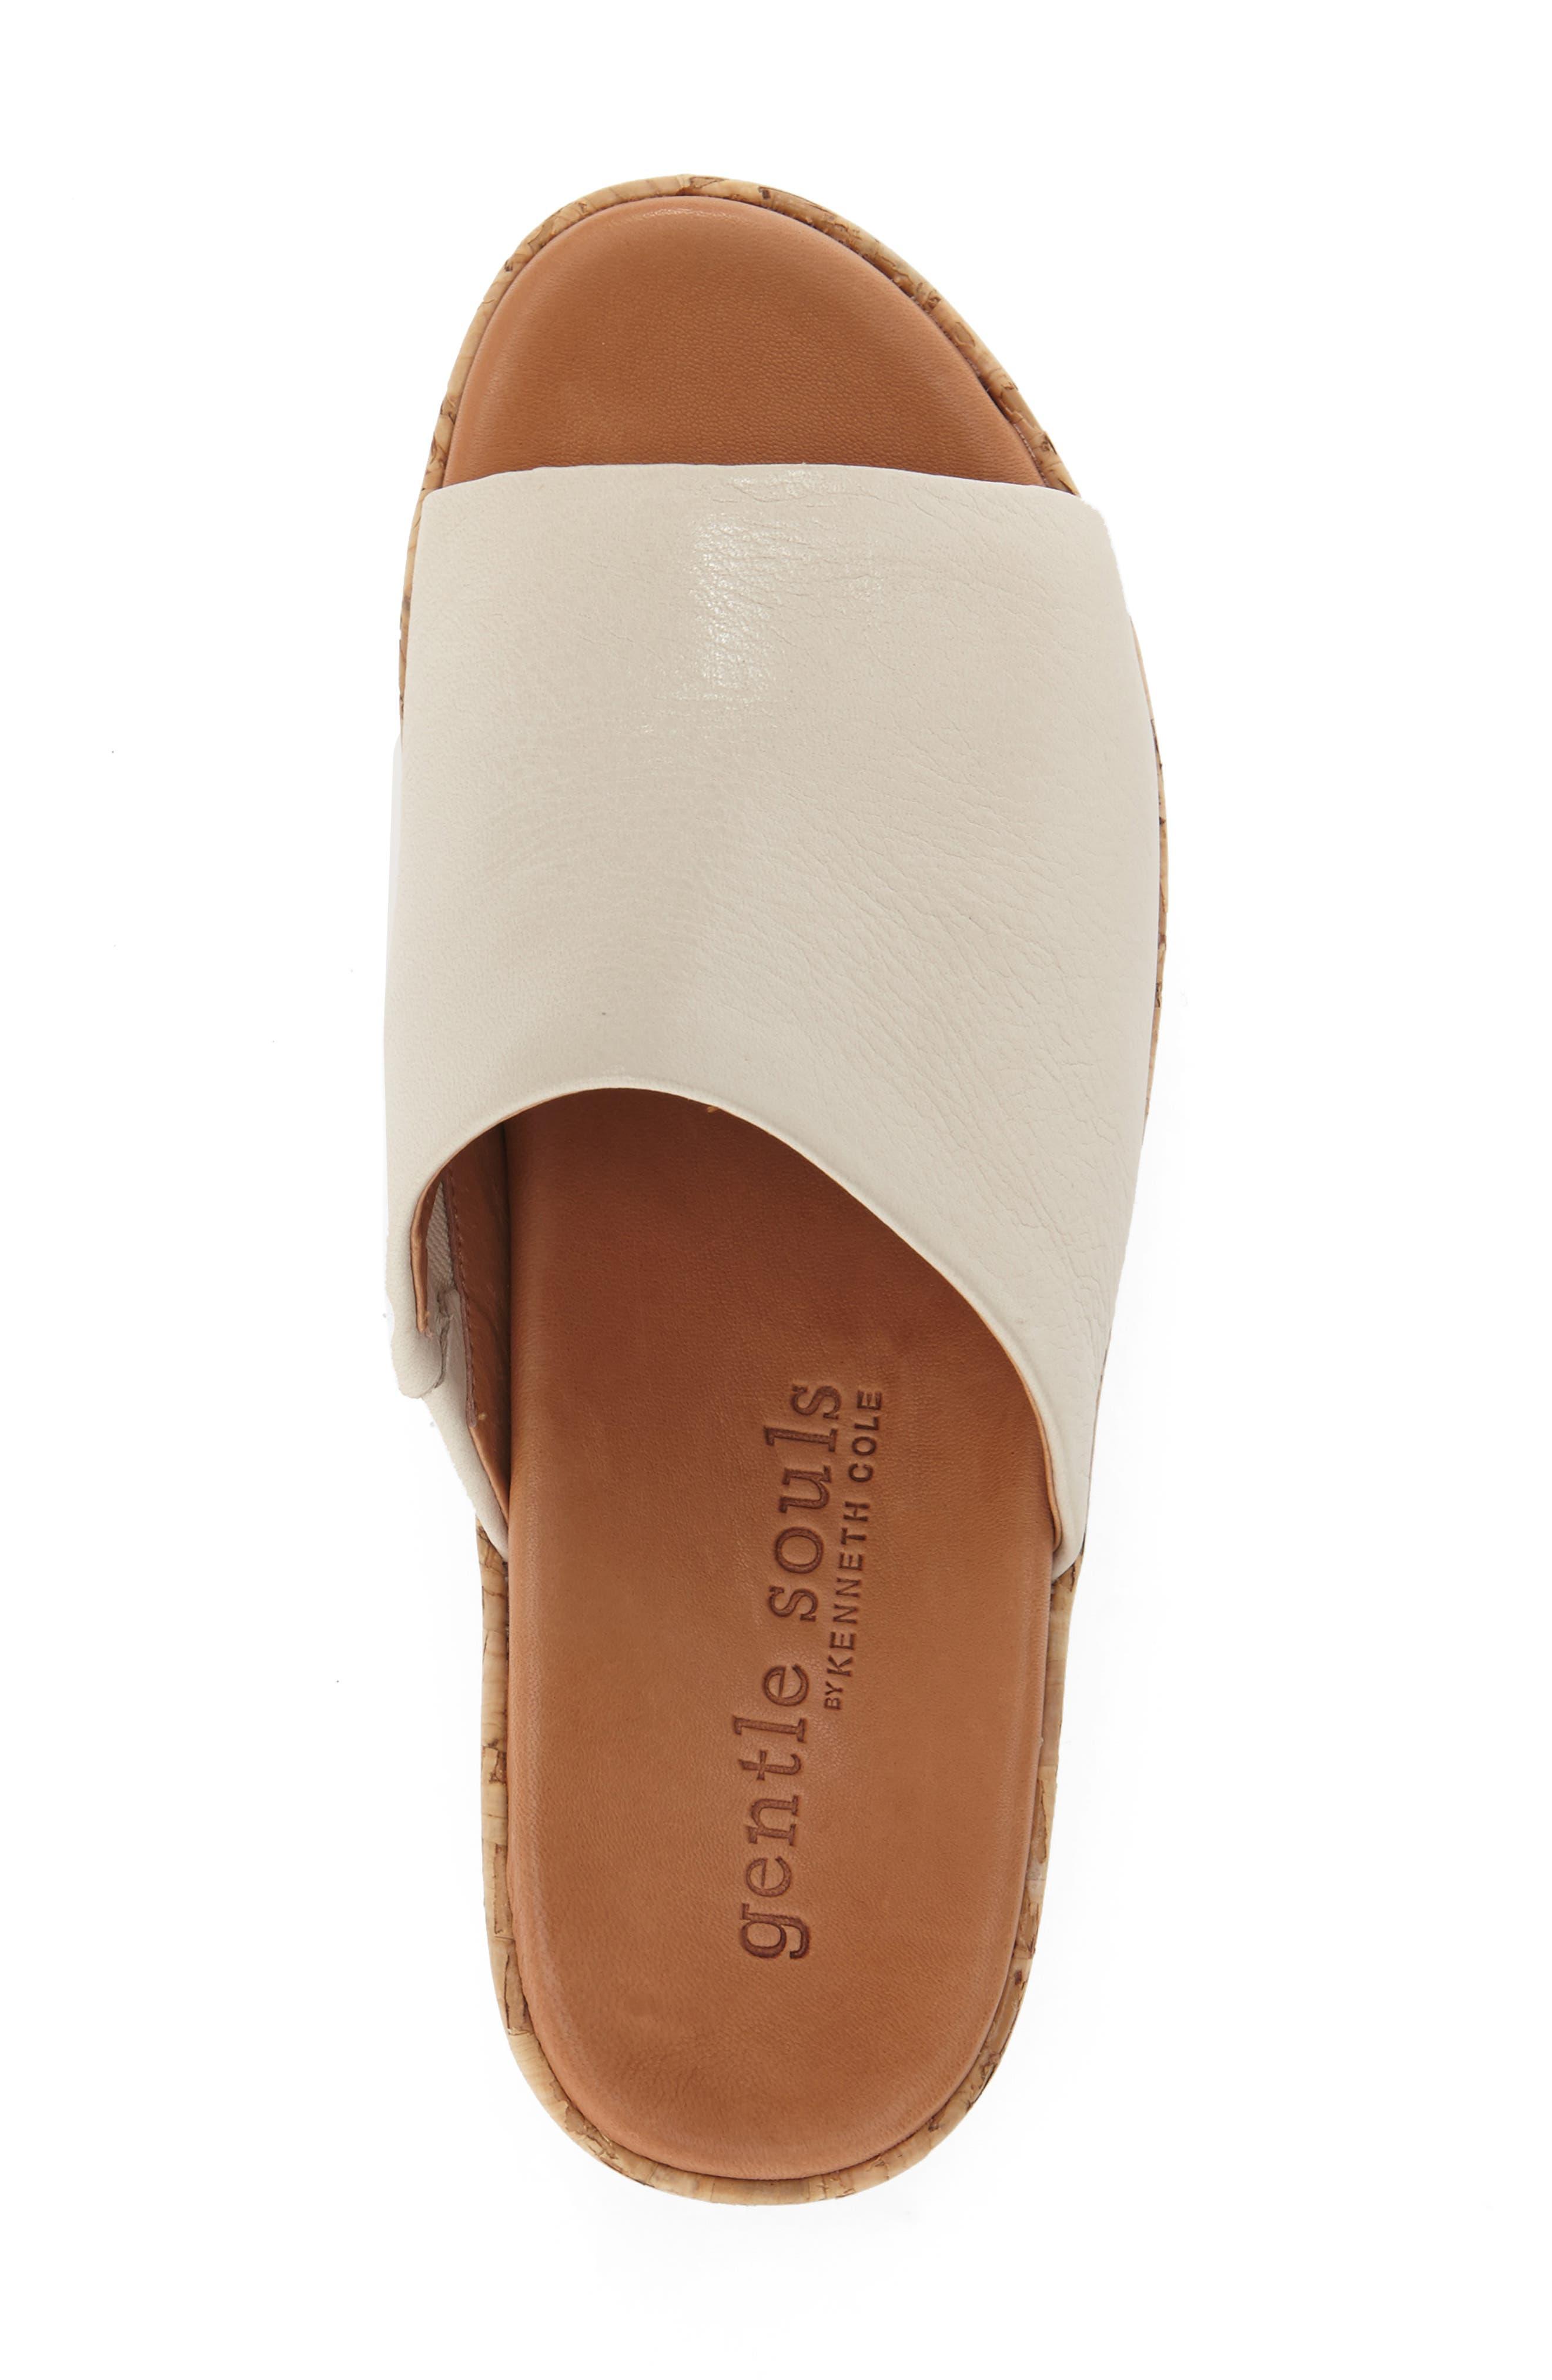 'Megan' Platform Wedge Sandal,                             Alternate thumbnail 6, color,                             053